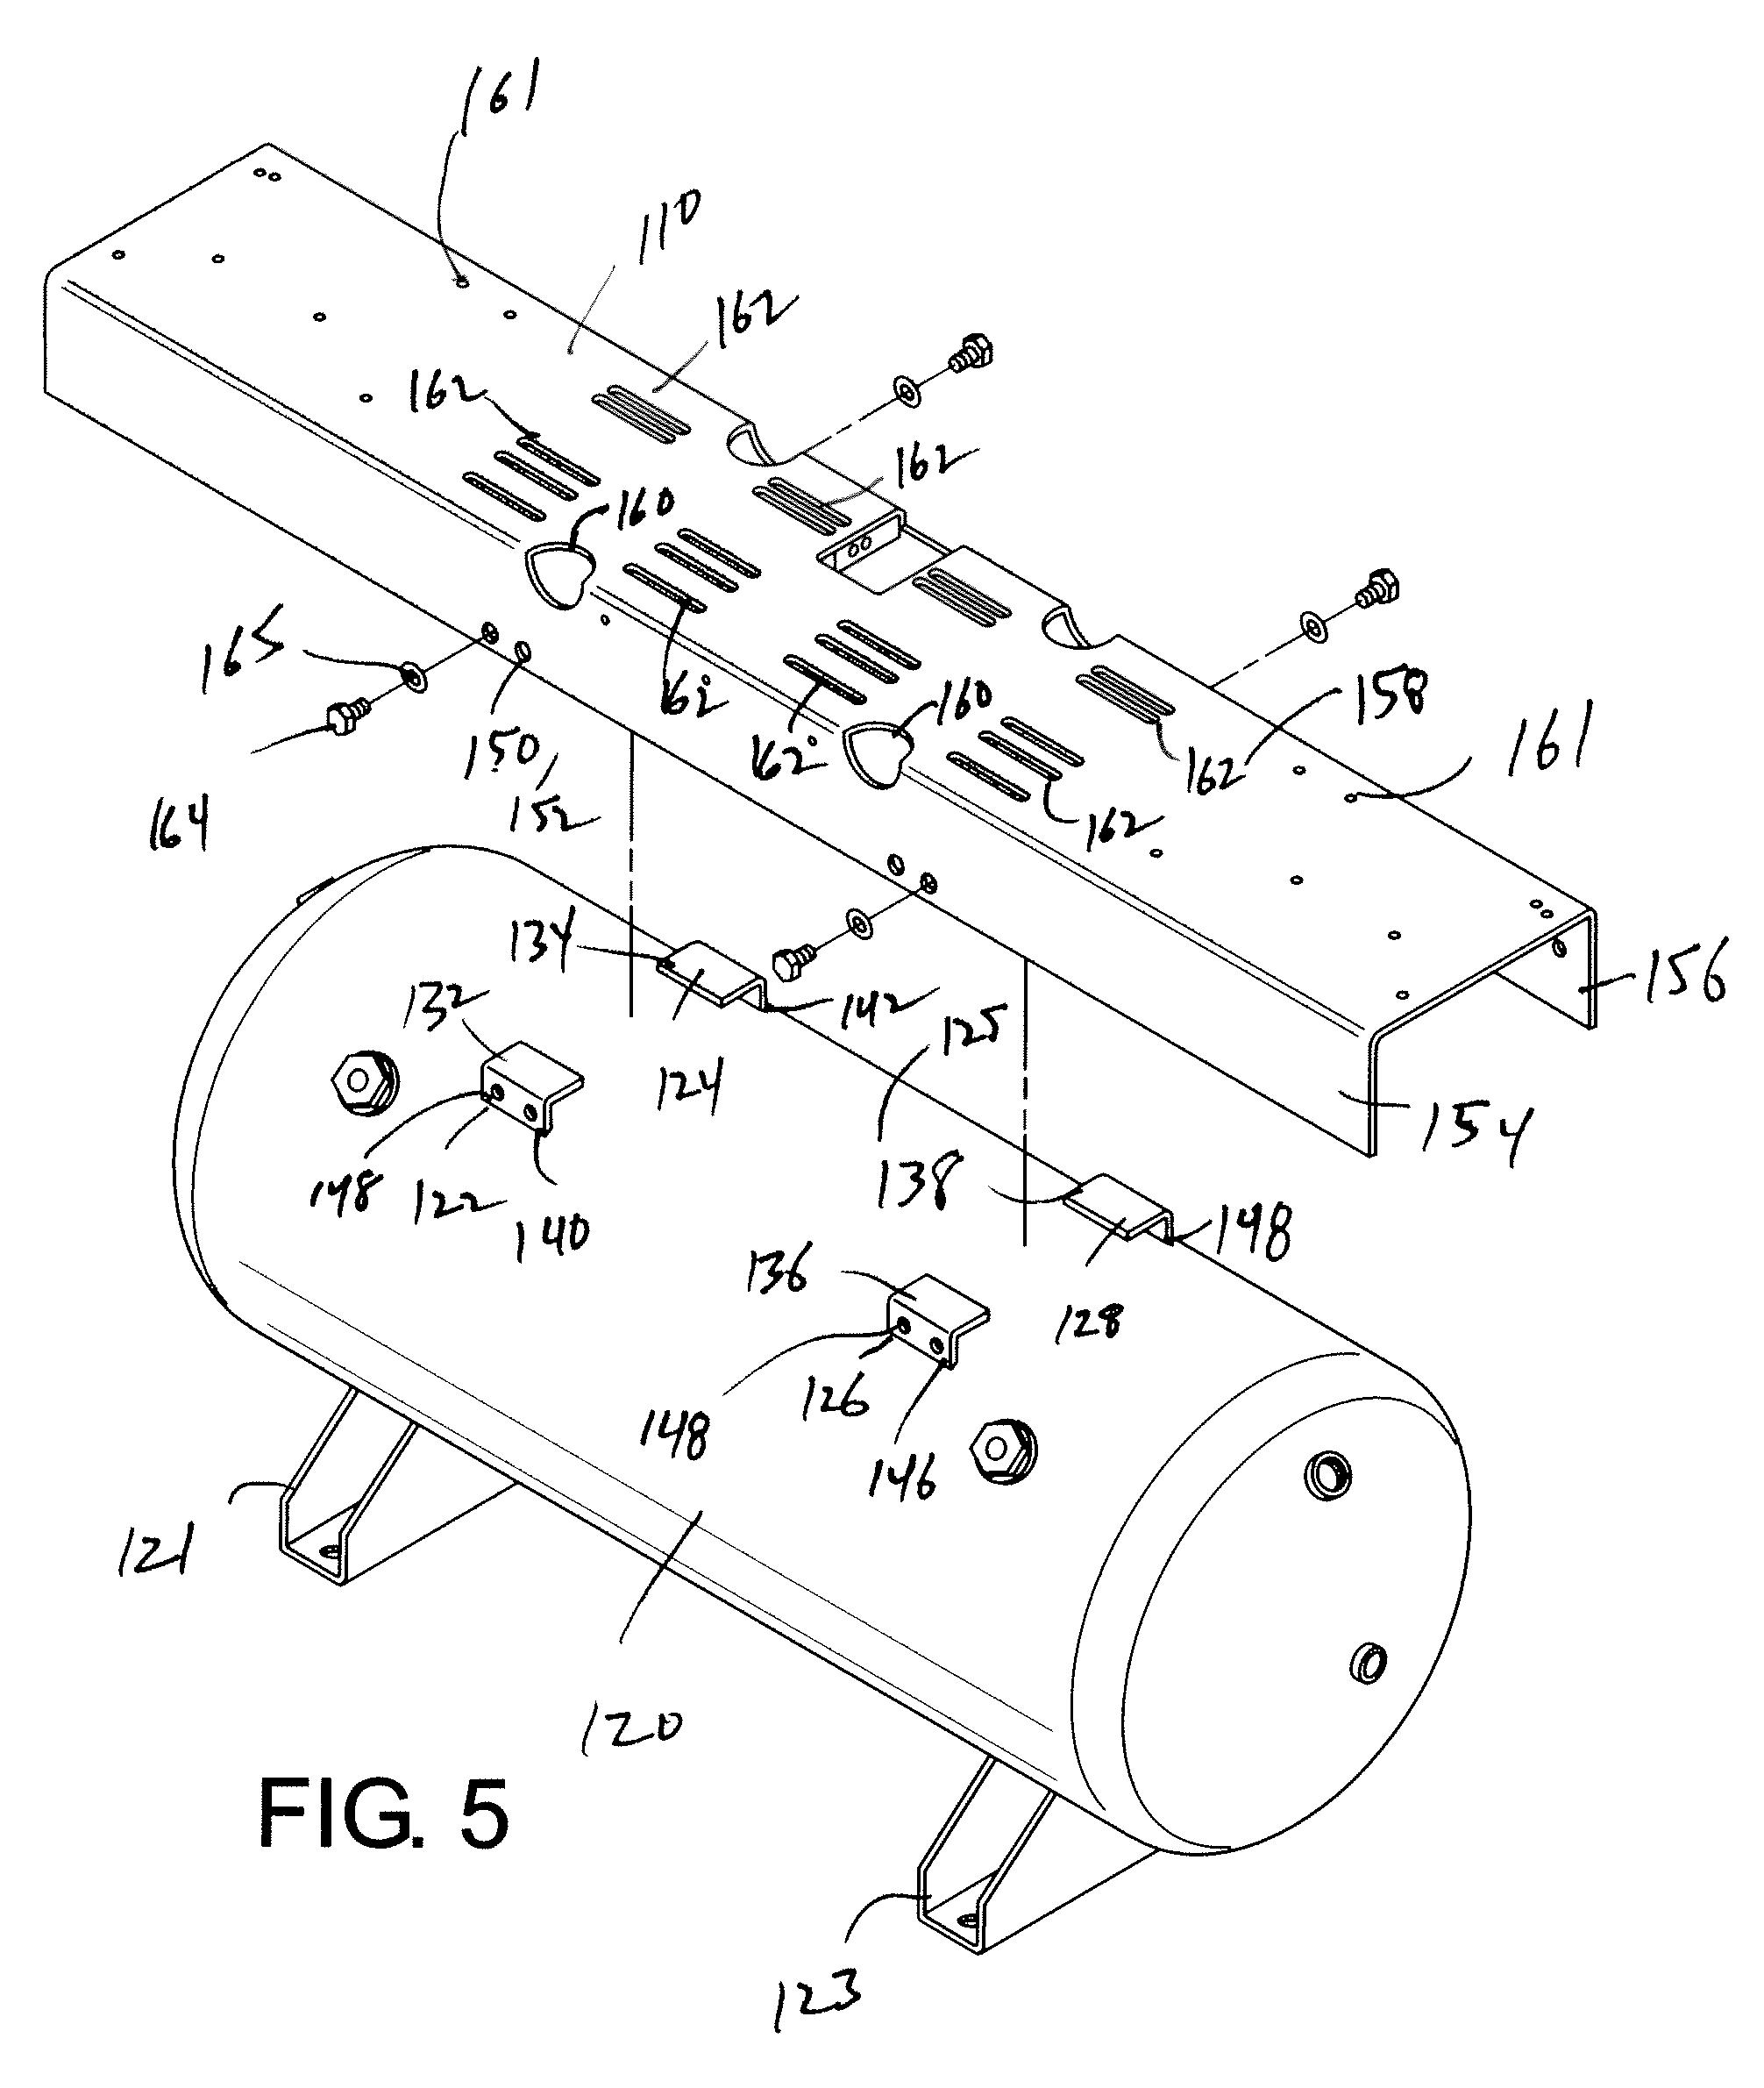 under dash wiring diagram , free wiring diagrams for motorcycles , gm  radio wiring diagram 12 pin , 1977 ford f 150 wiring diagram voltage  regulator